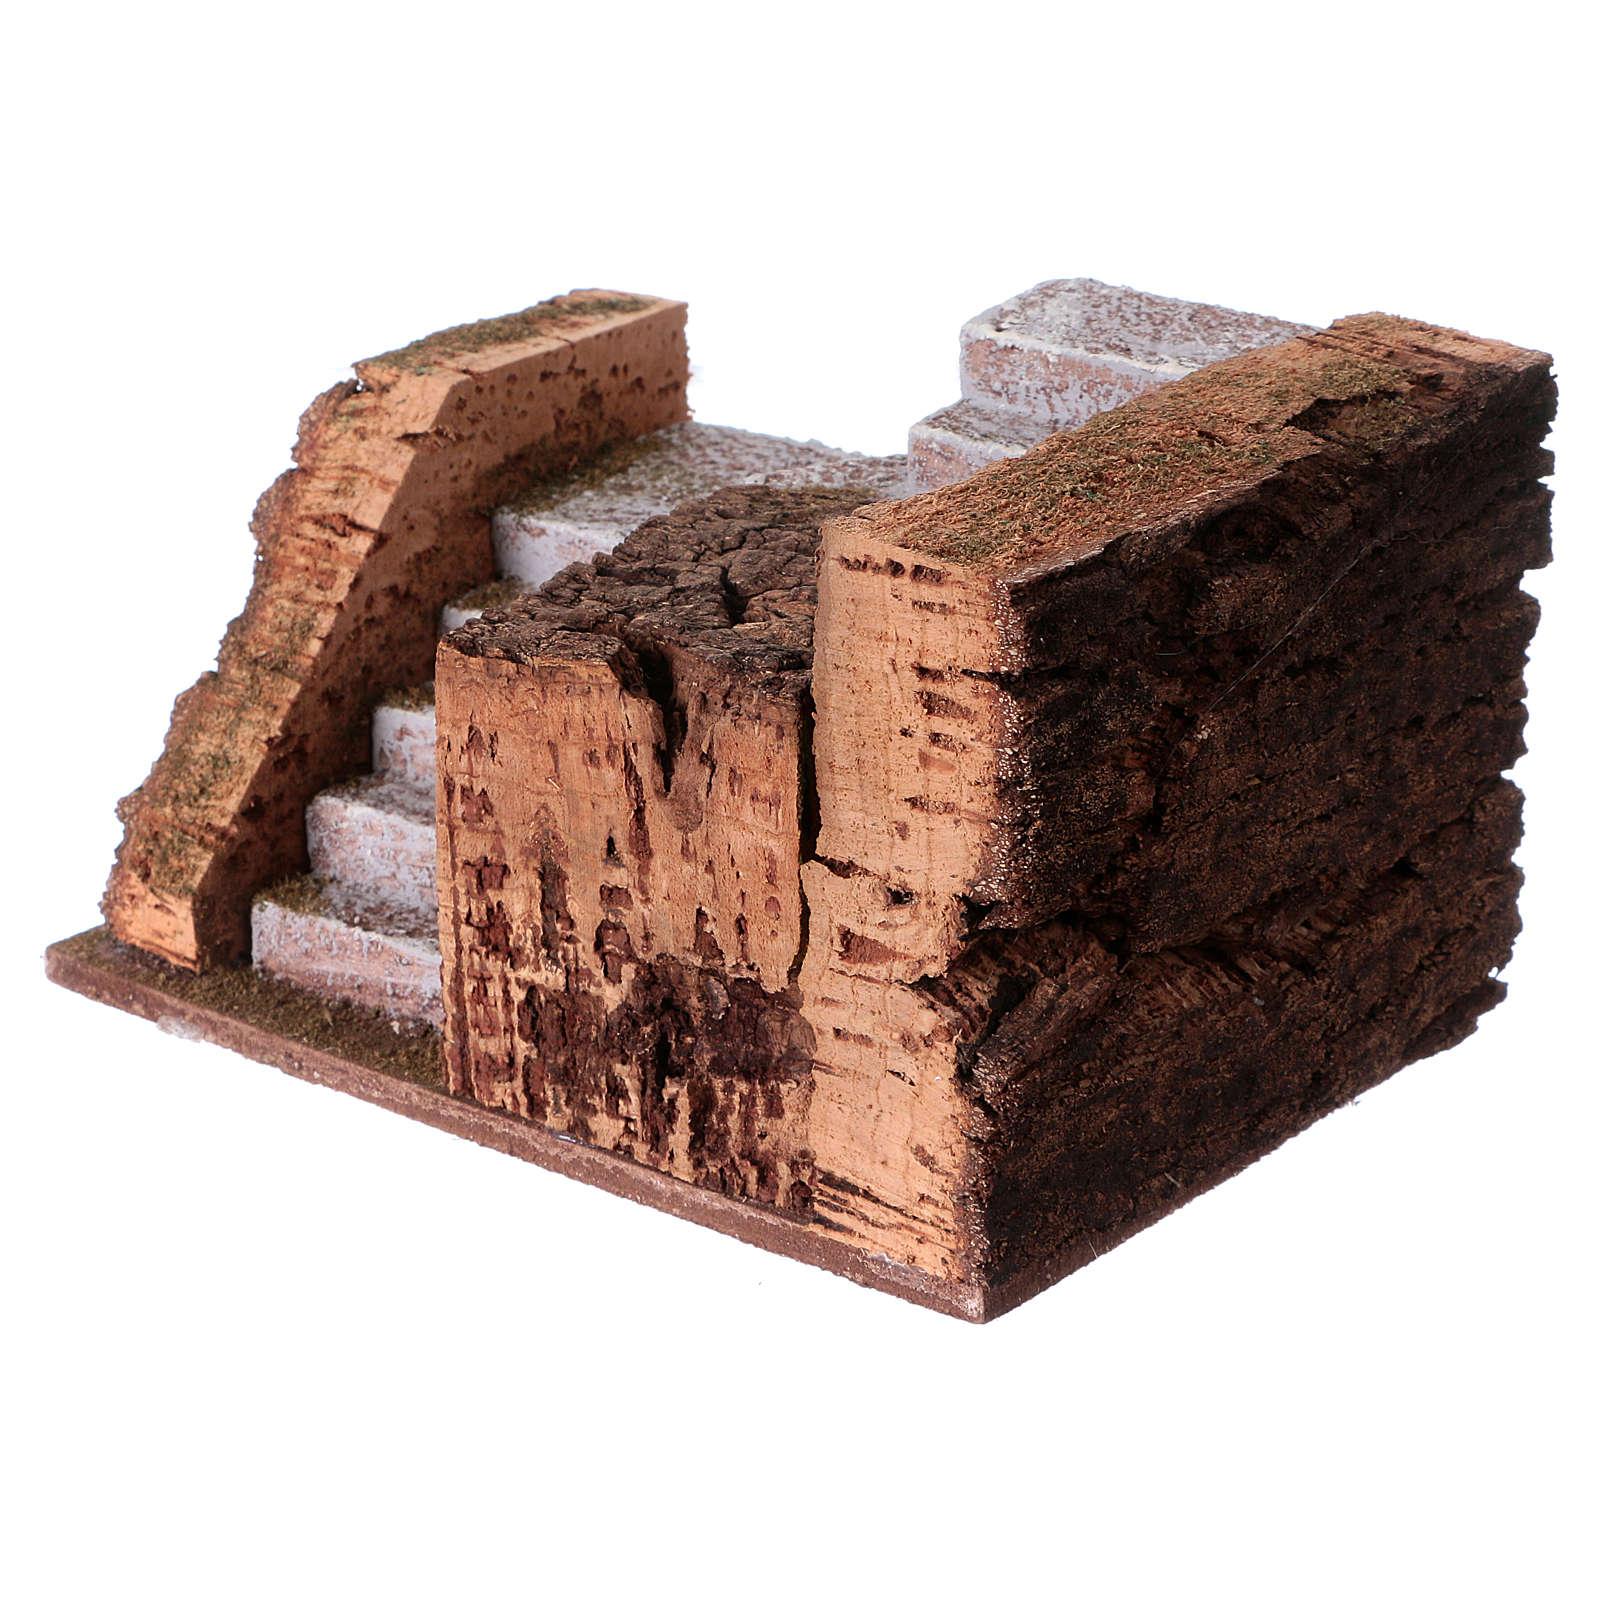 Escalera para pastores 10 cm 9x15x10 4